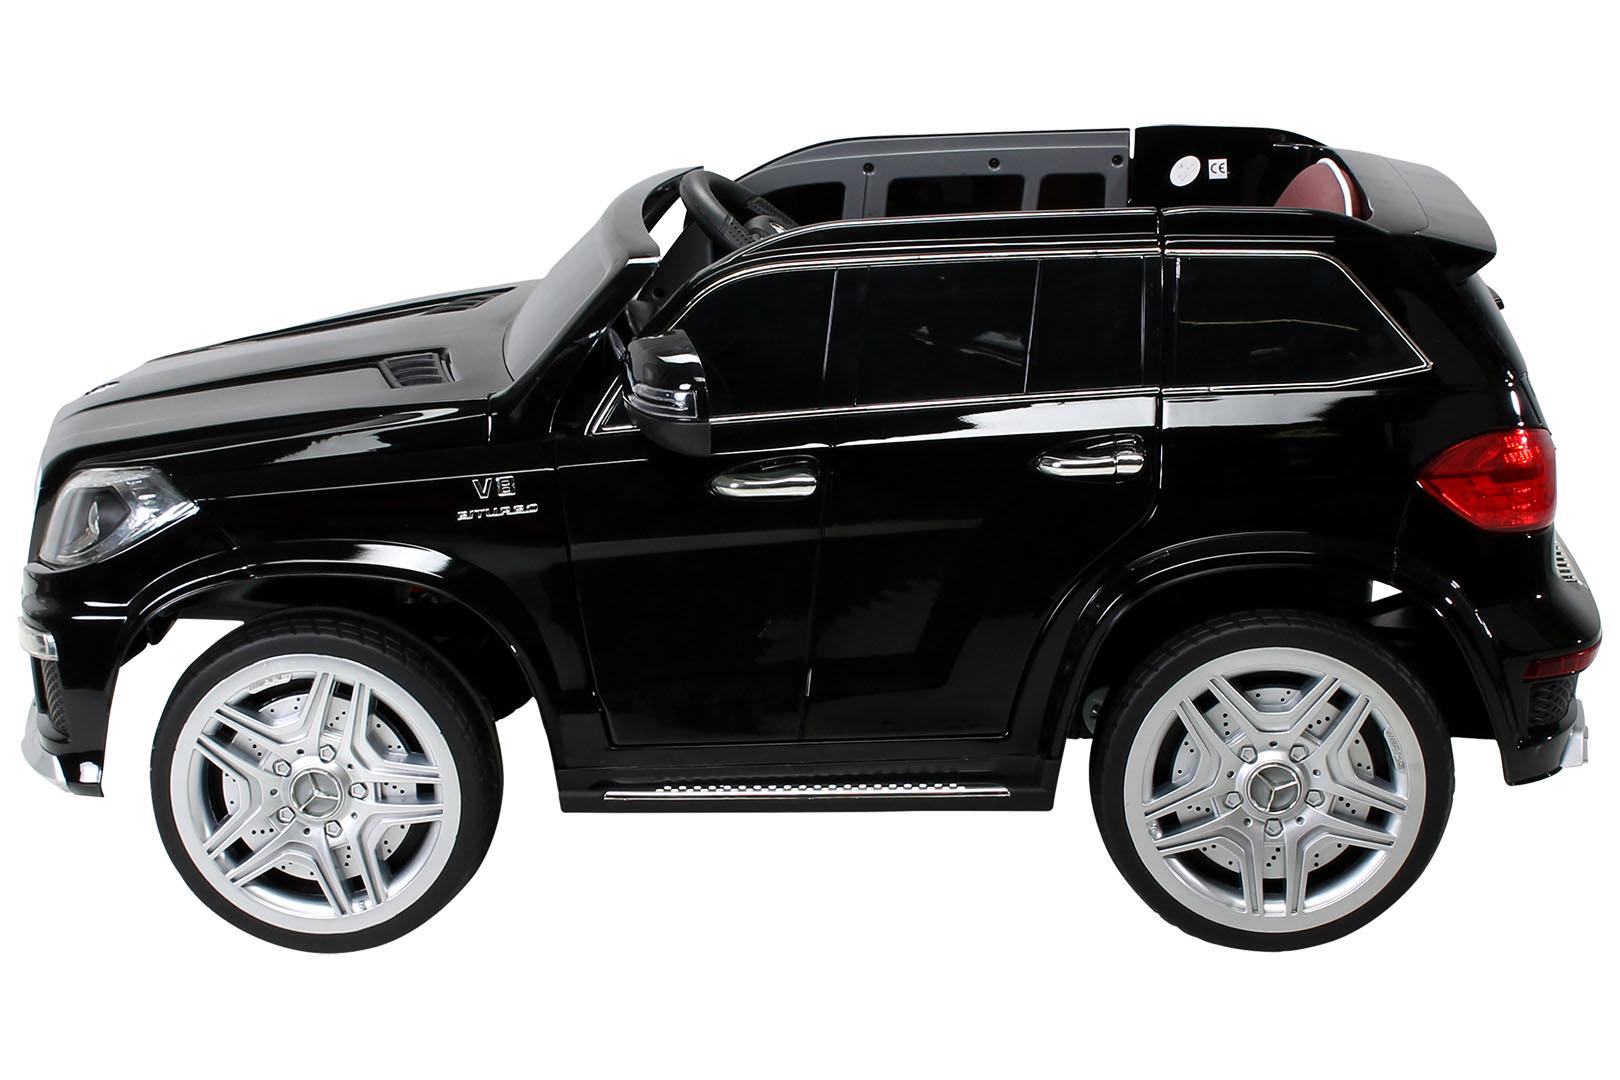 kinder elektro auto mercedes gl63 lizenziert suv kinderauto elektrofahrzeug ebay. Black Bedroom Furniture Sets. Home Design Ideas